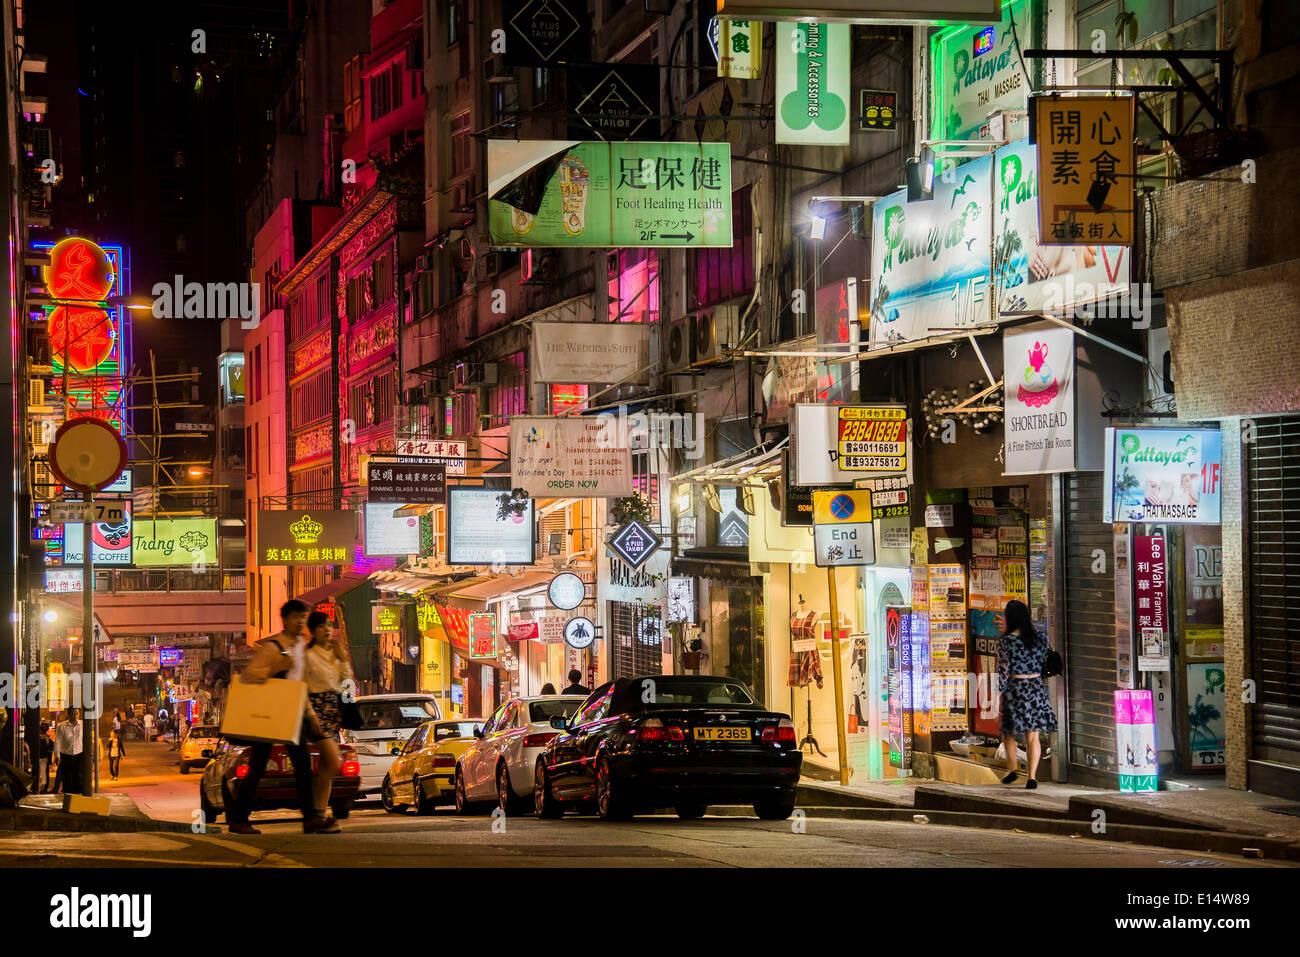 El distrito de entretenimiento, Wyndham Street, la Isla de Hong Kong, Hong Kong, China Imagen De Stock